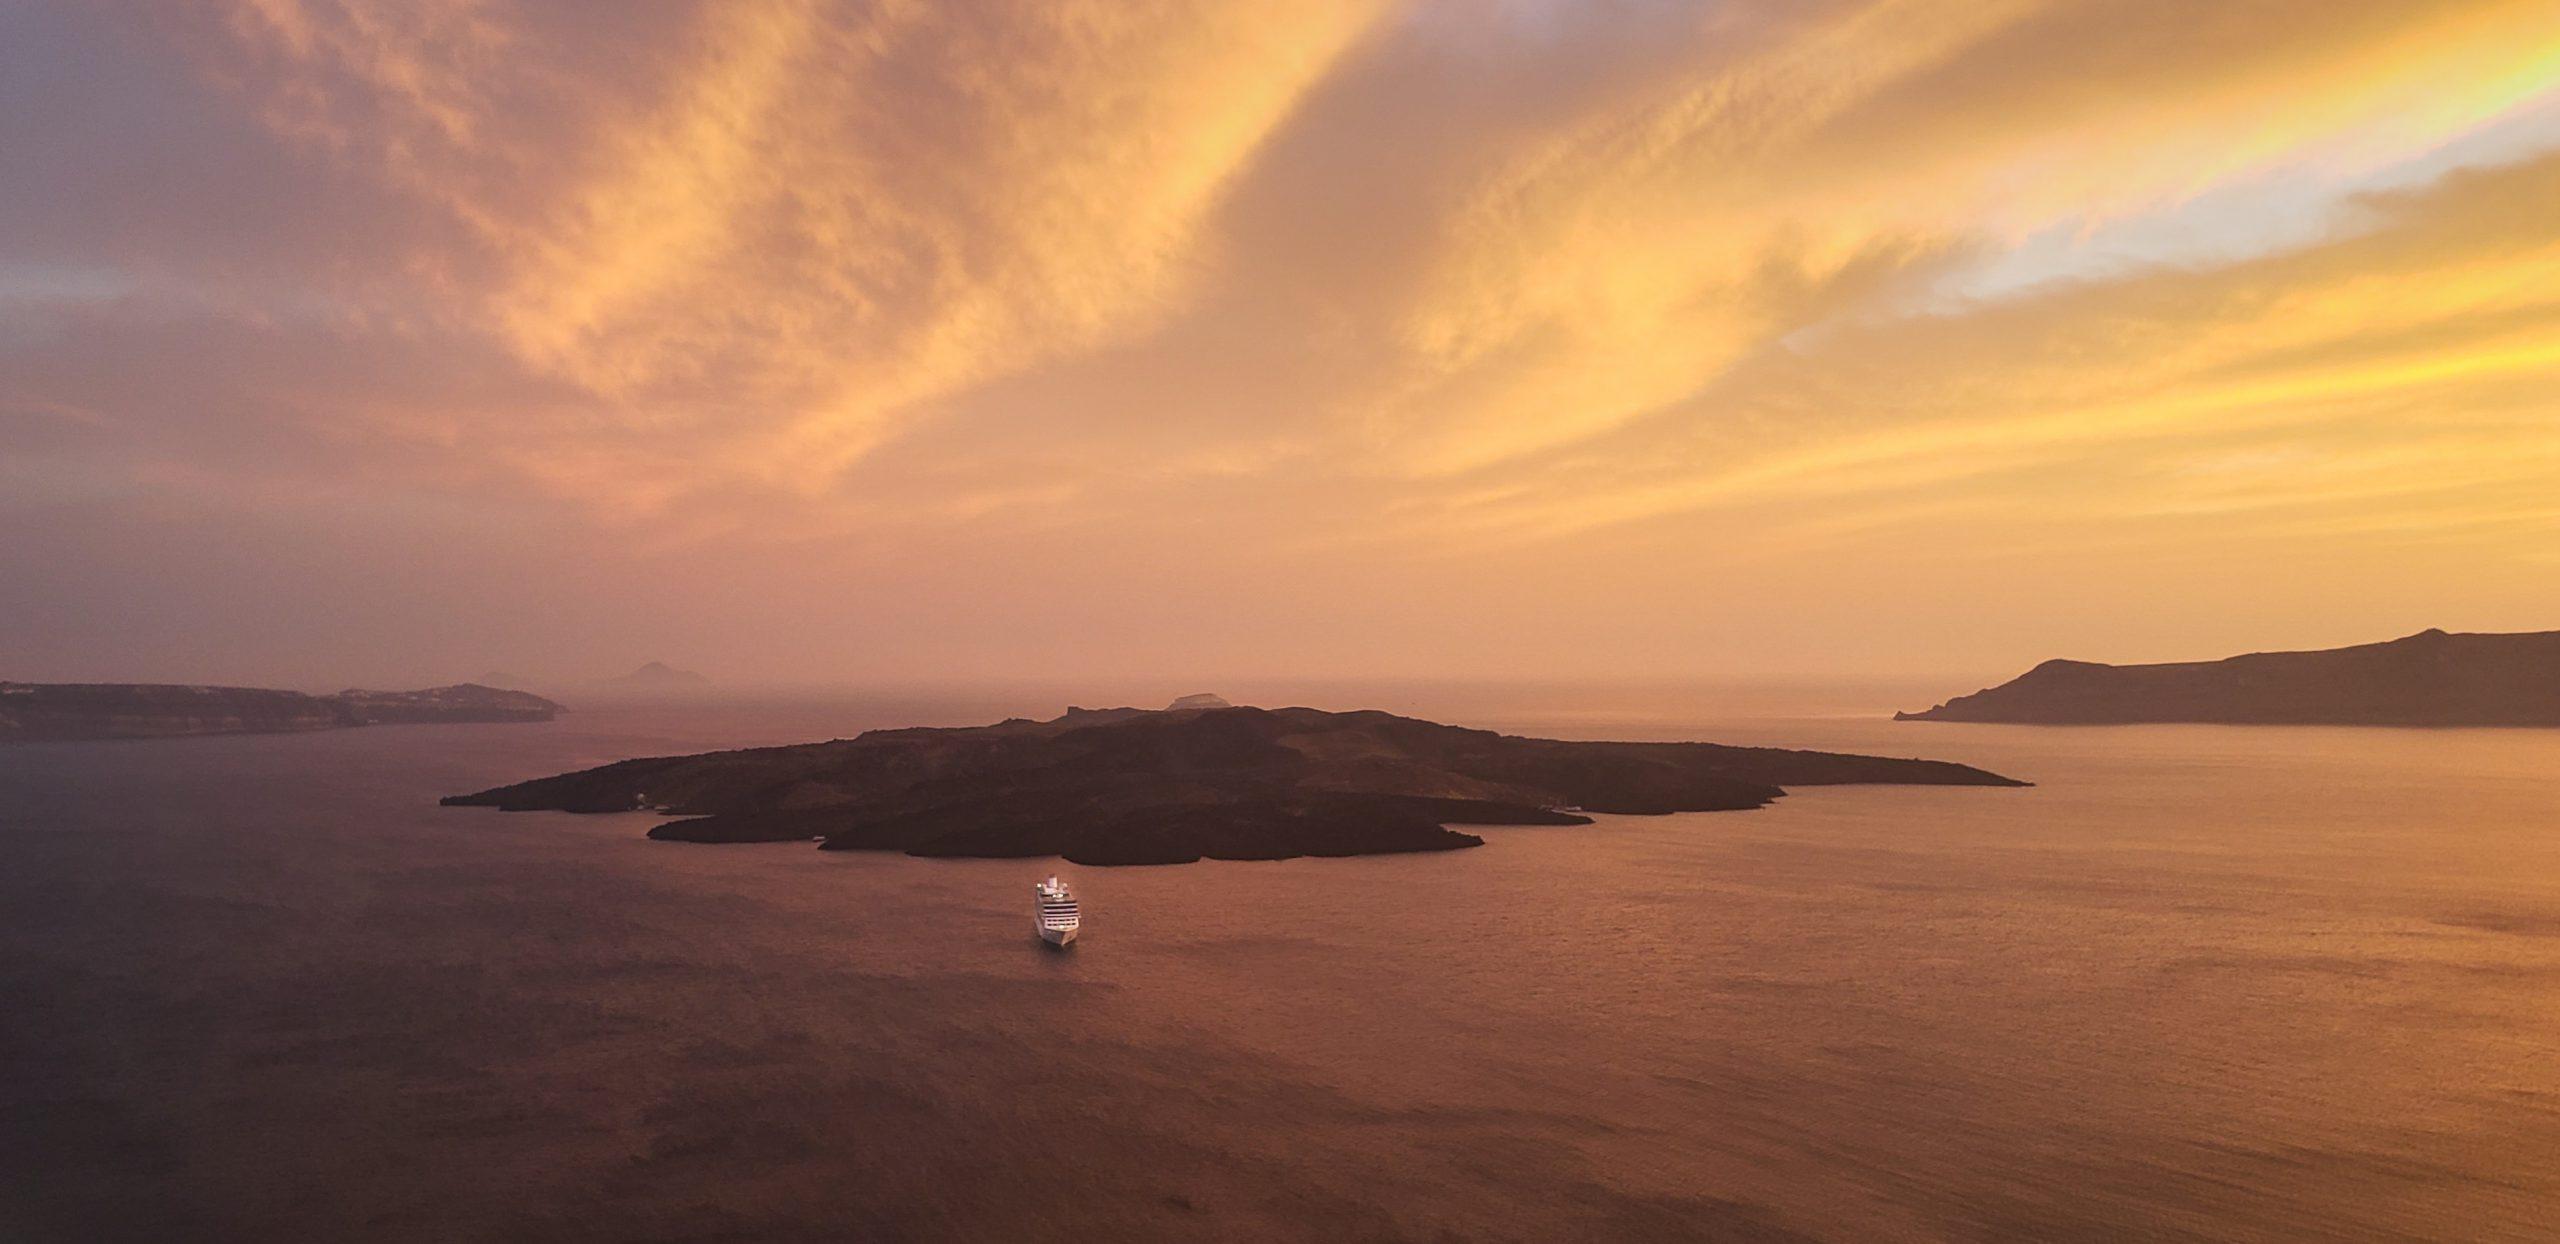 Santorini Caldera View Summer 2018